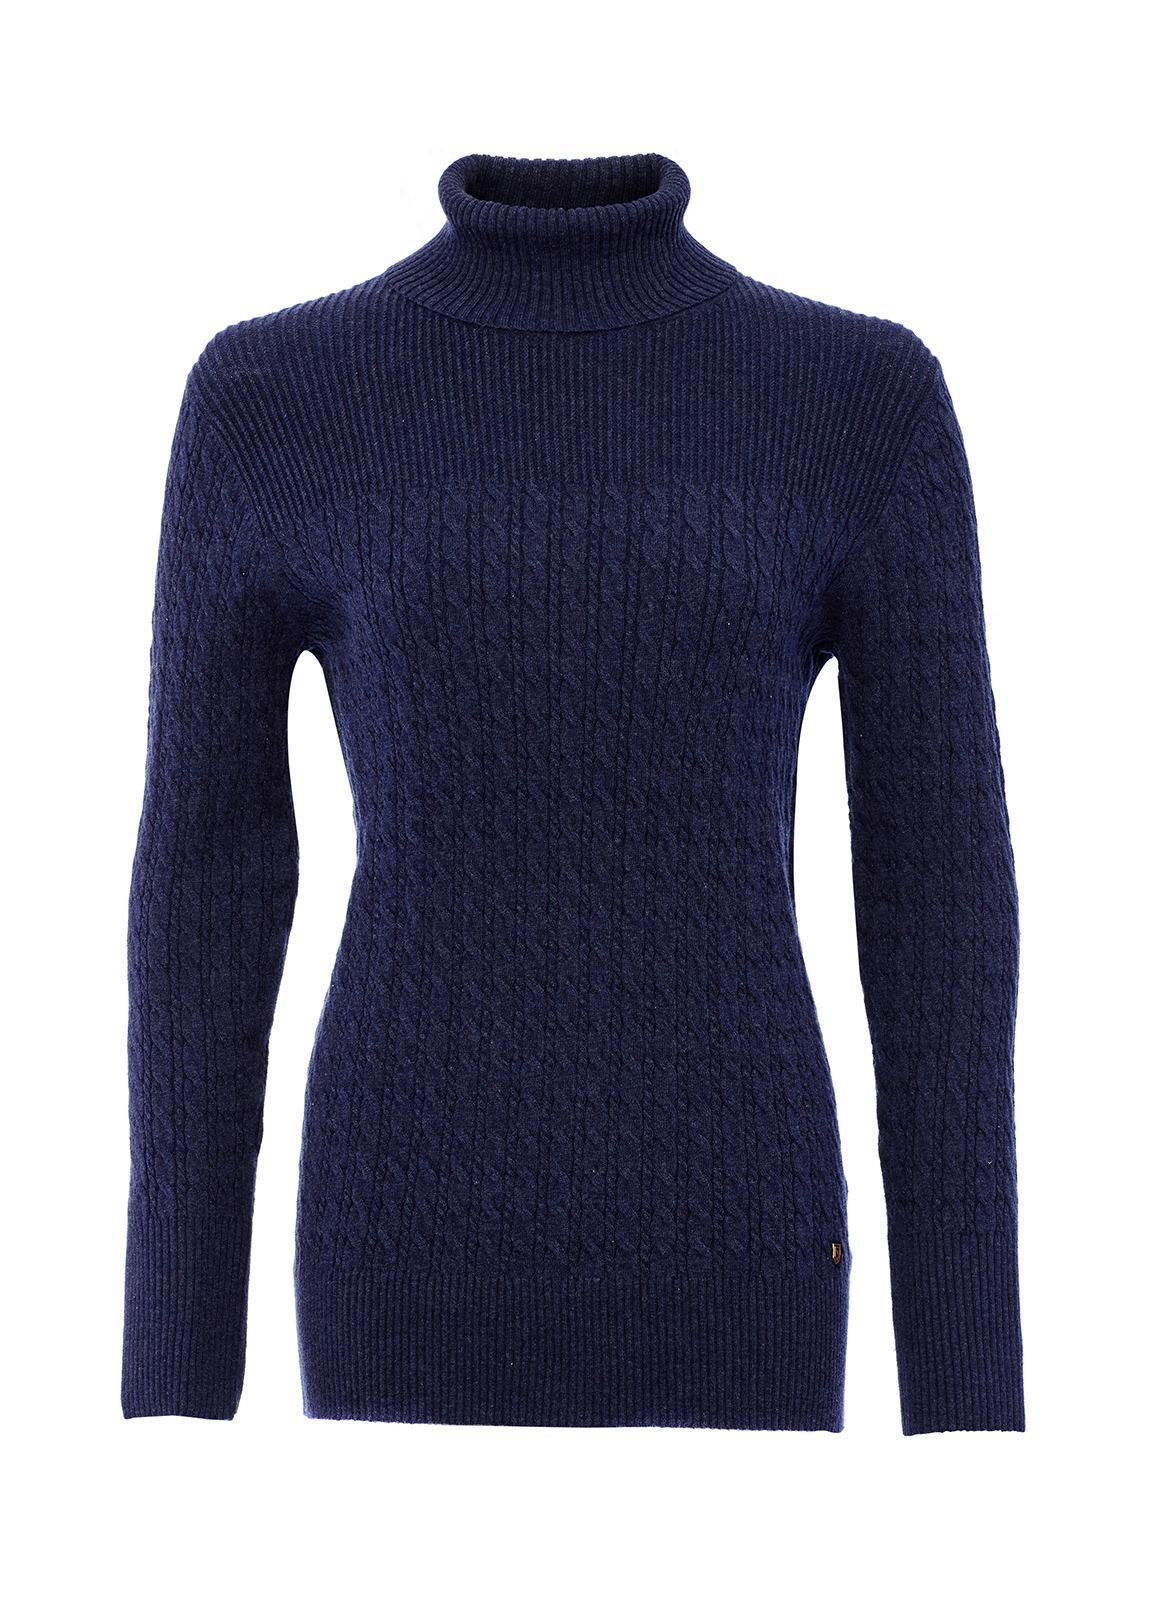 Dubarry_ Boylan Polo Neck Sweater - French Navy_Image_2